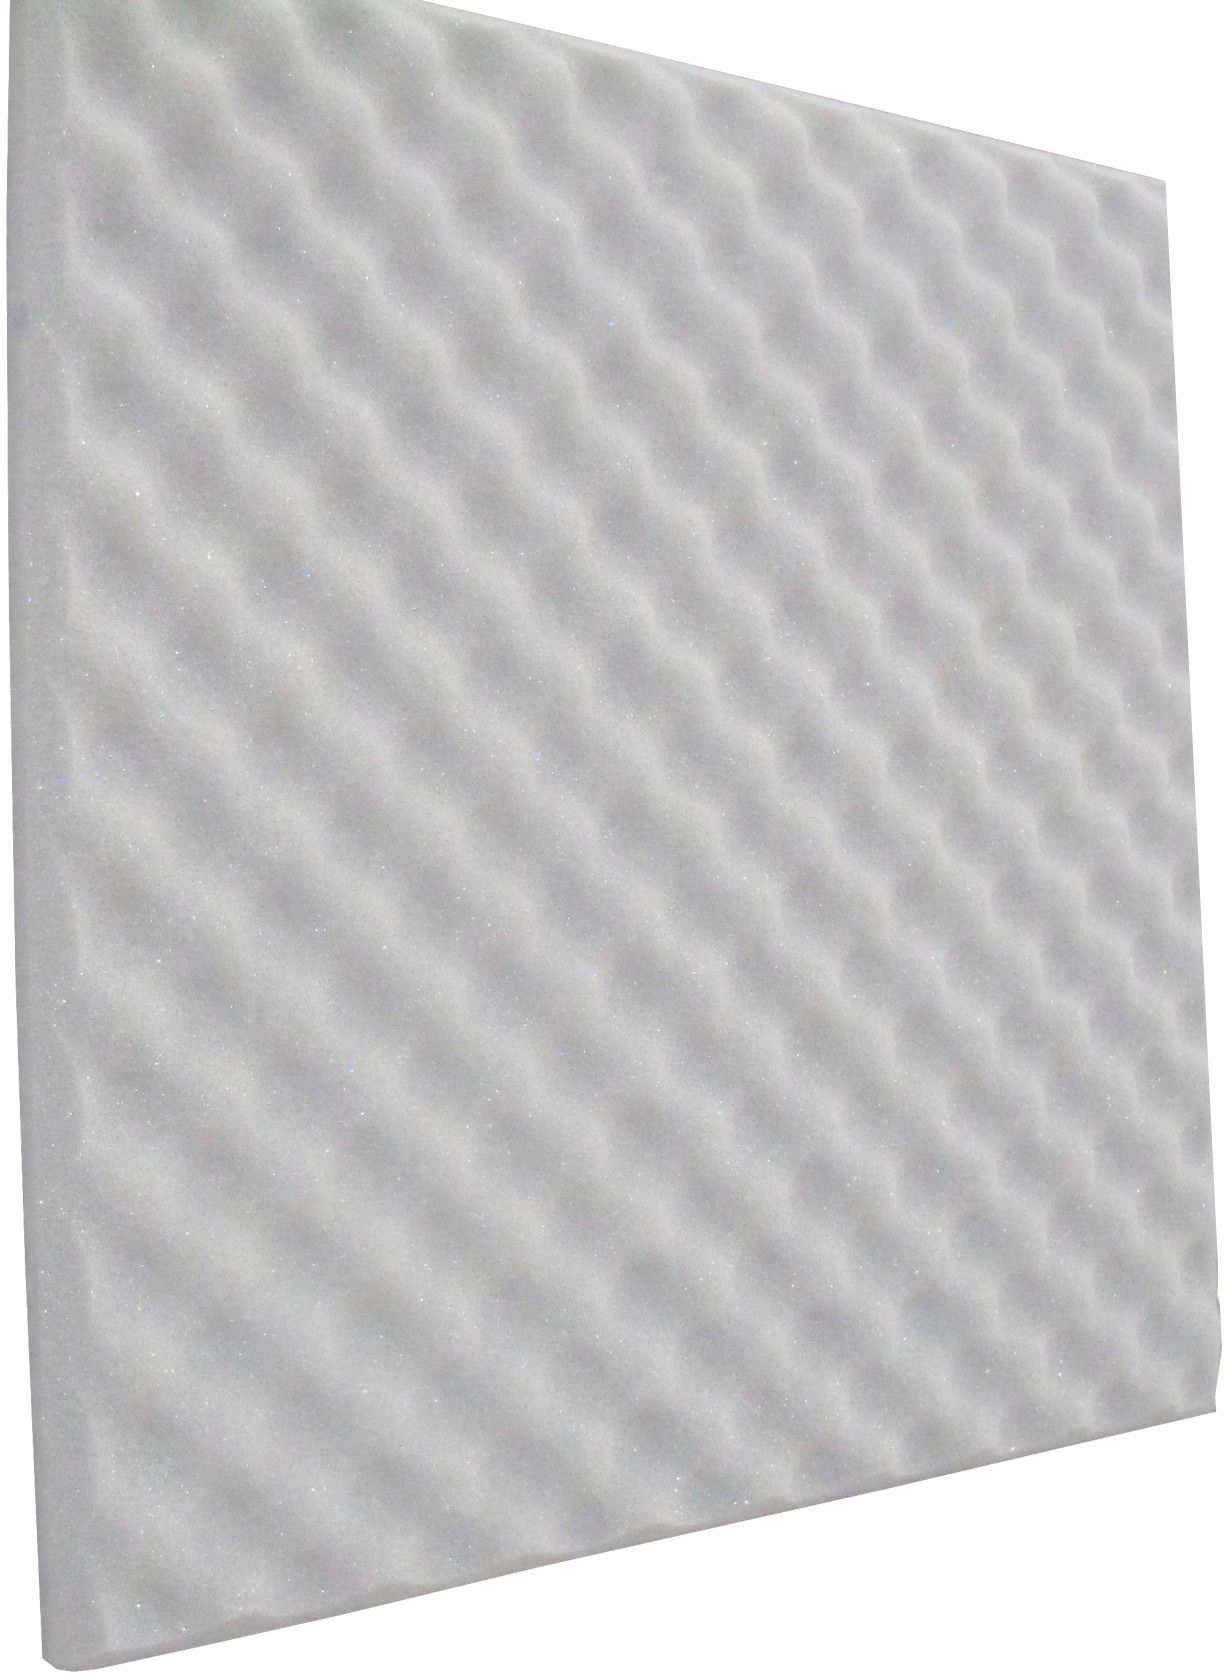 Espuma perfilada - Kit 8 peças - Branco Gelo - 30mm (2m²)  - Loja SPL Acústica